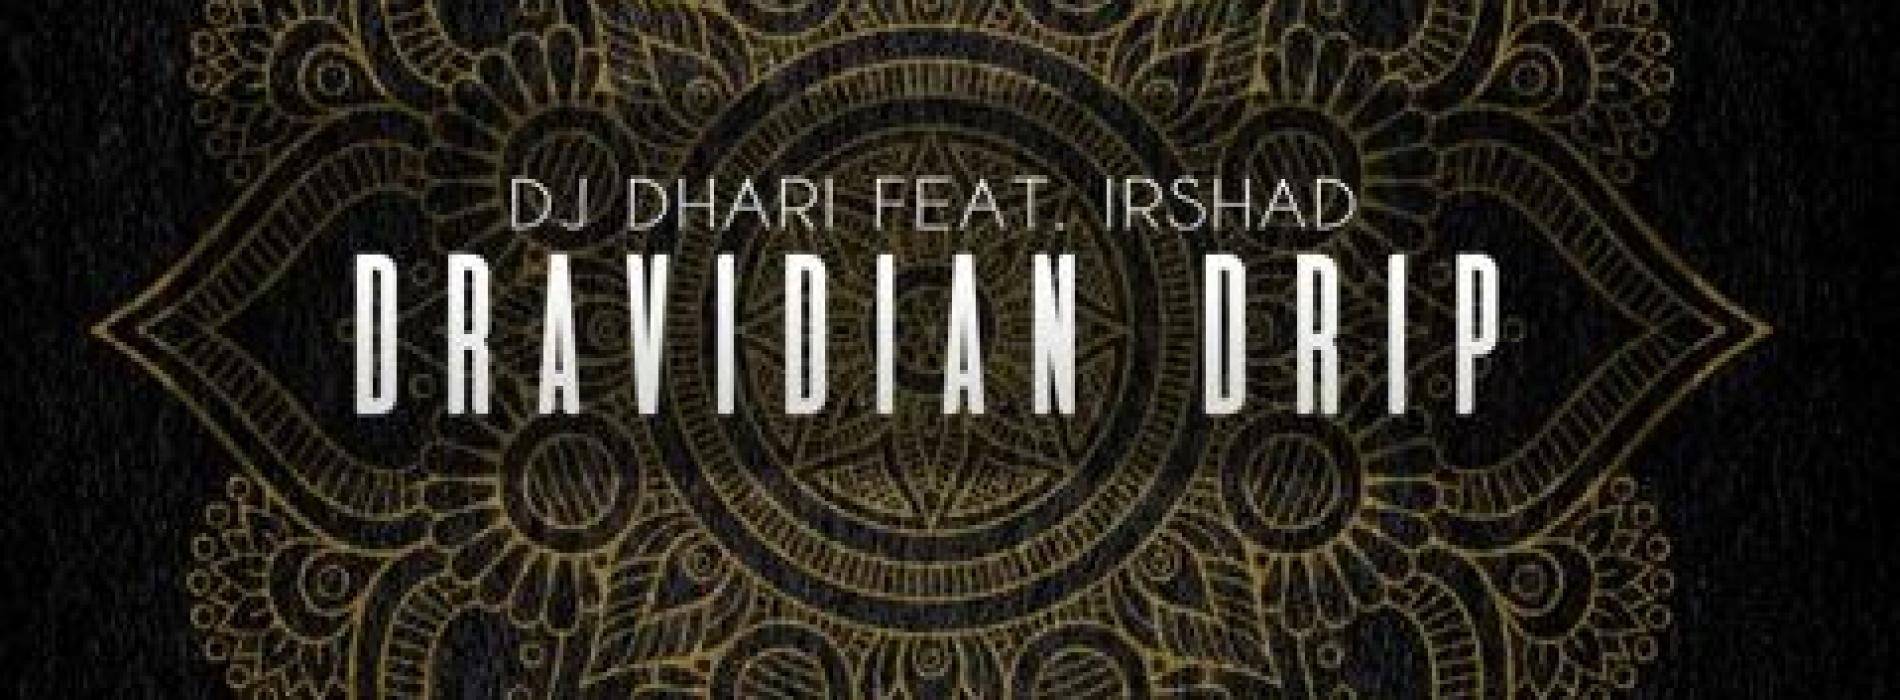 New Music : Dj Dhari Ft Irshad – Dravidian Drip (Original)